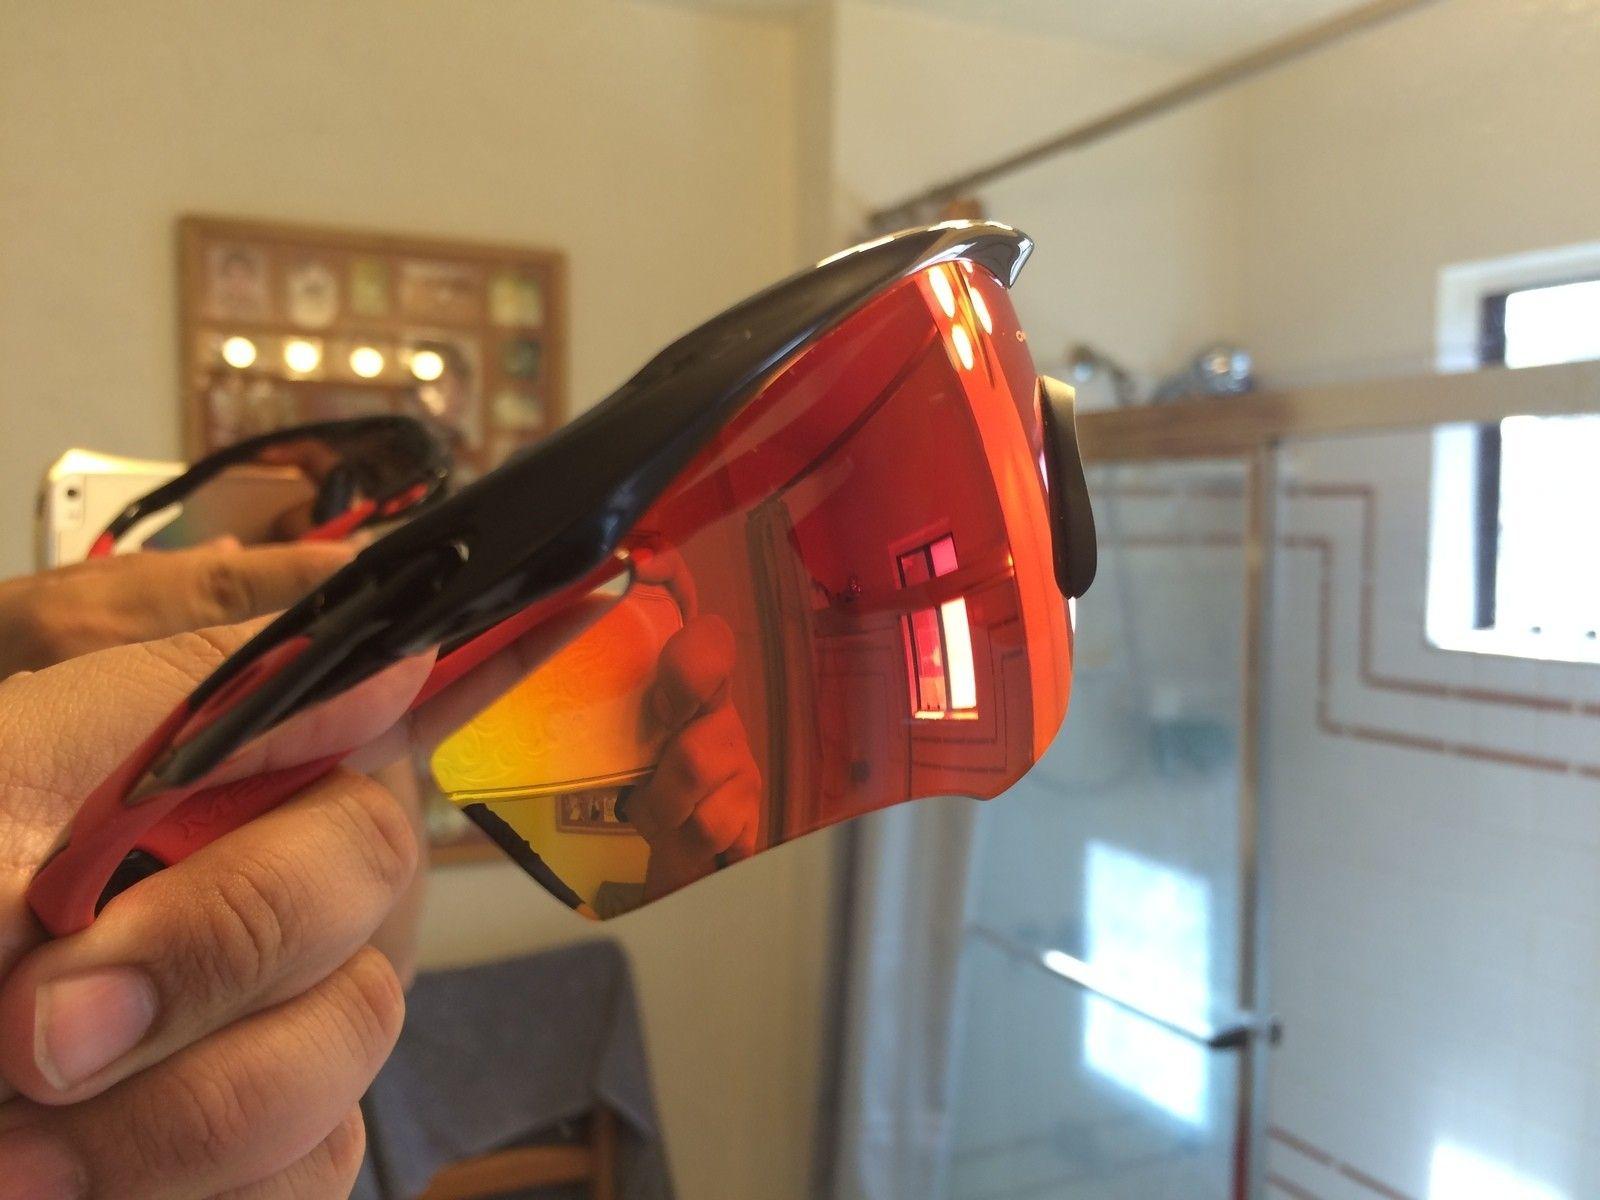 M2 Frame - Polarized- New- under $99 - 2015-05-24 16.41.32.jpg